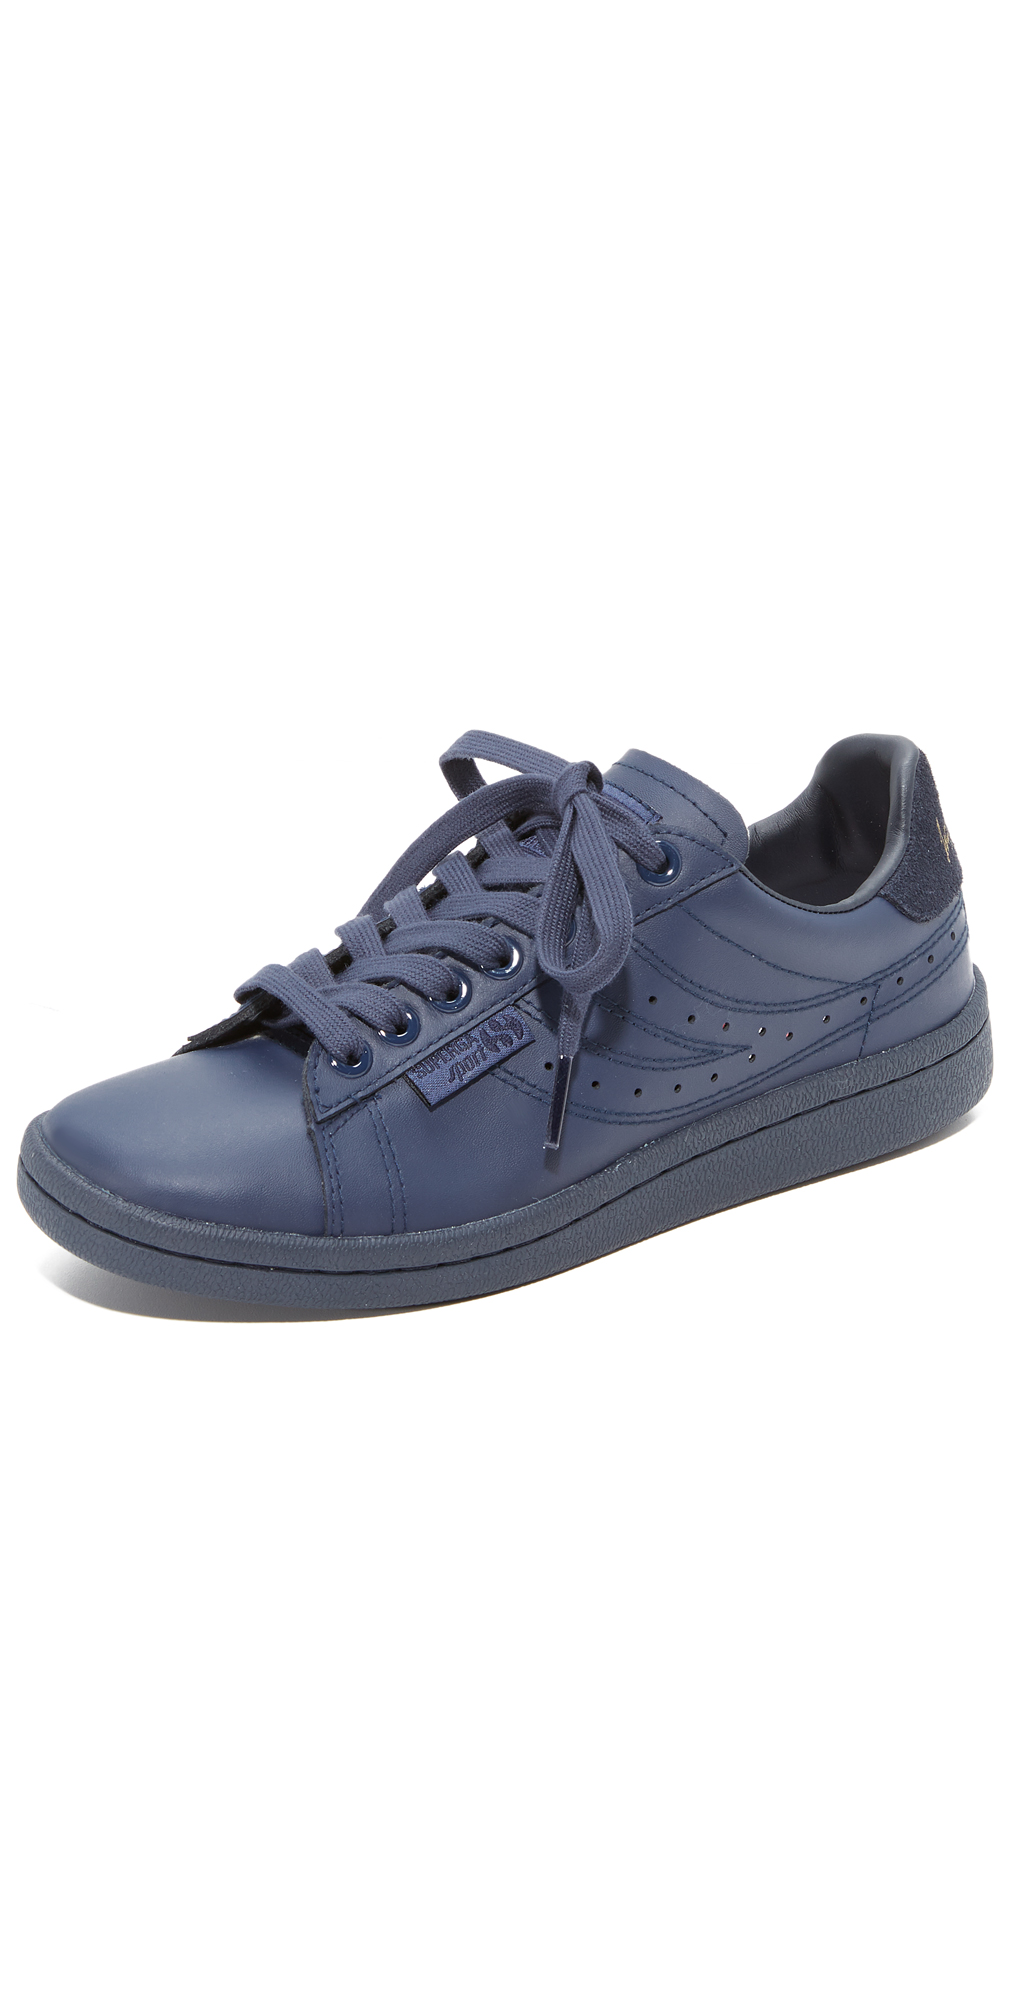 Lendl 4832 EFGLU Sneakers Superga